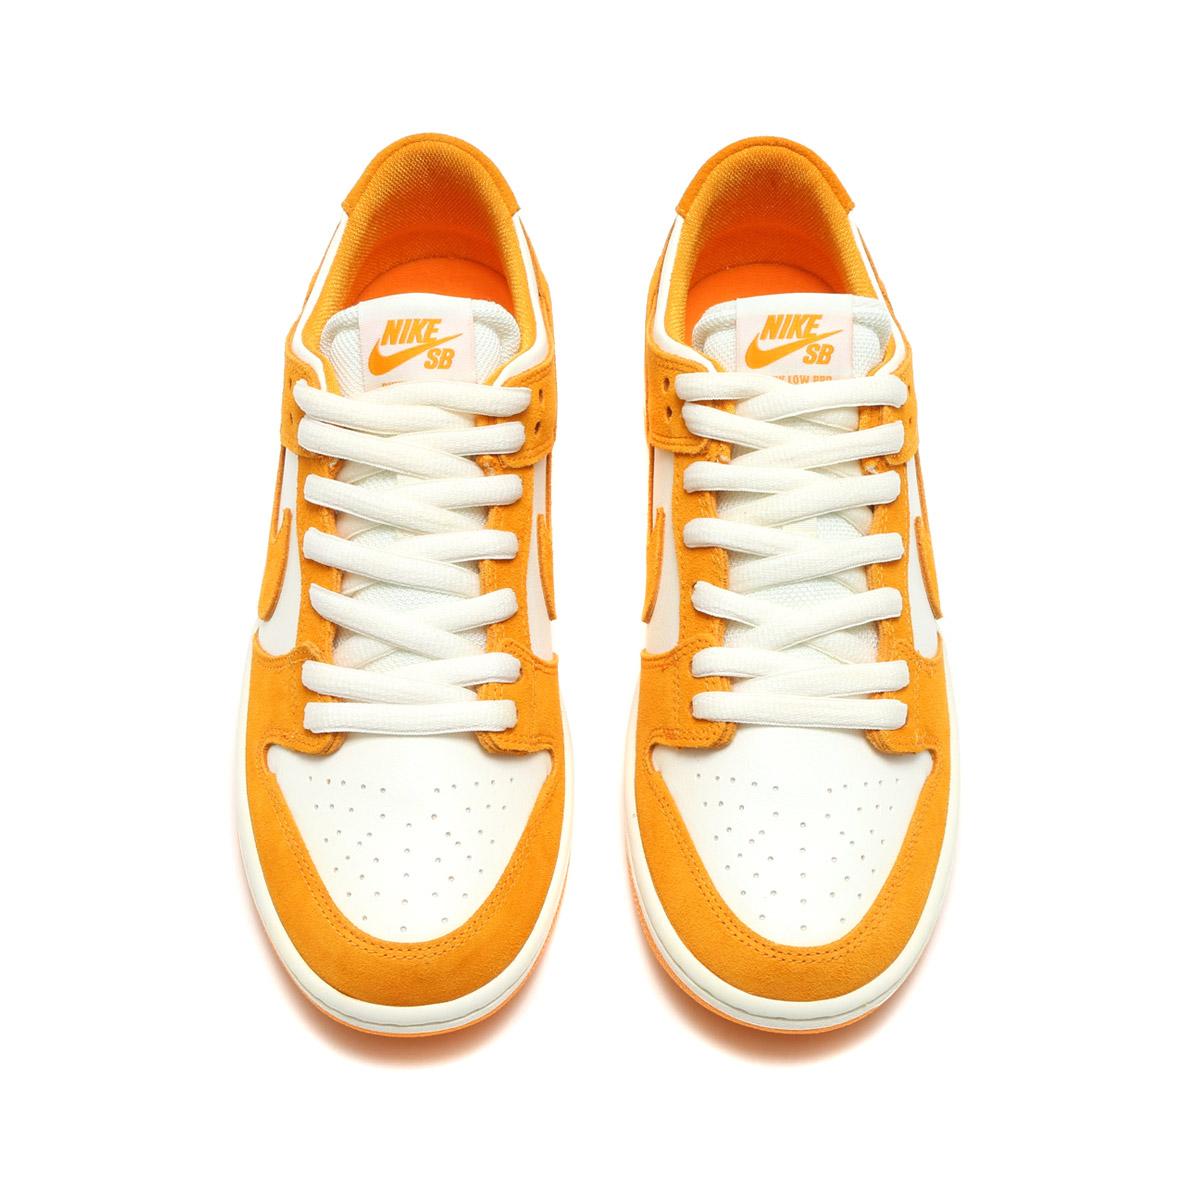 size 40 53de3 05d2a NIKE SB ZOOM DUNK LOW PRO (Nike Nike SB zoom dunk low pro) (CIRCUIT  ORANGE CIRCUIT ORANGE-SAIL) 17FA-S